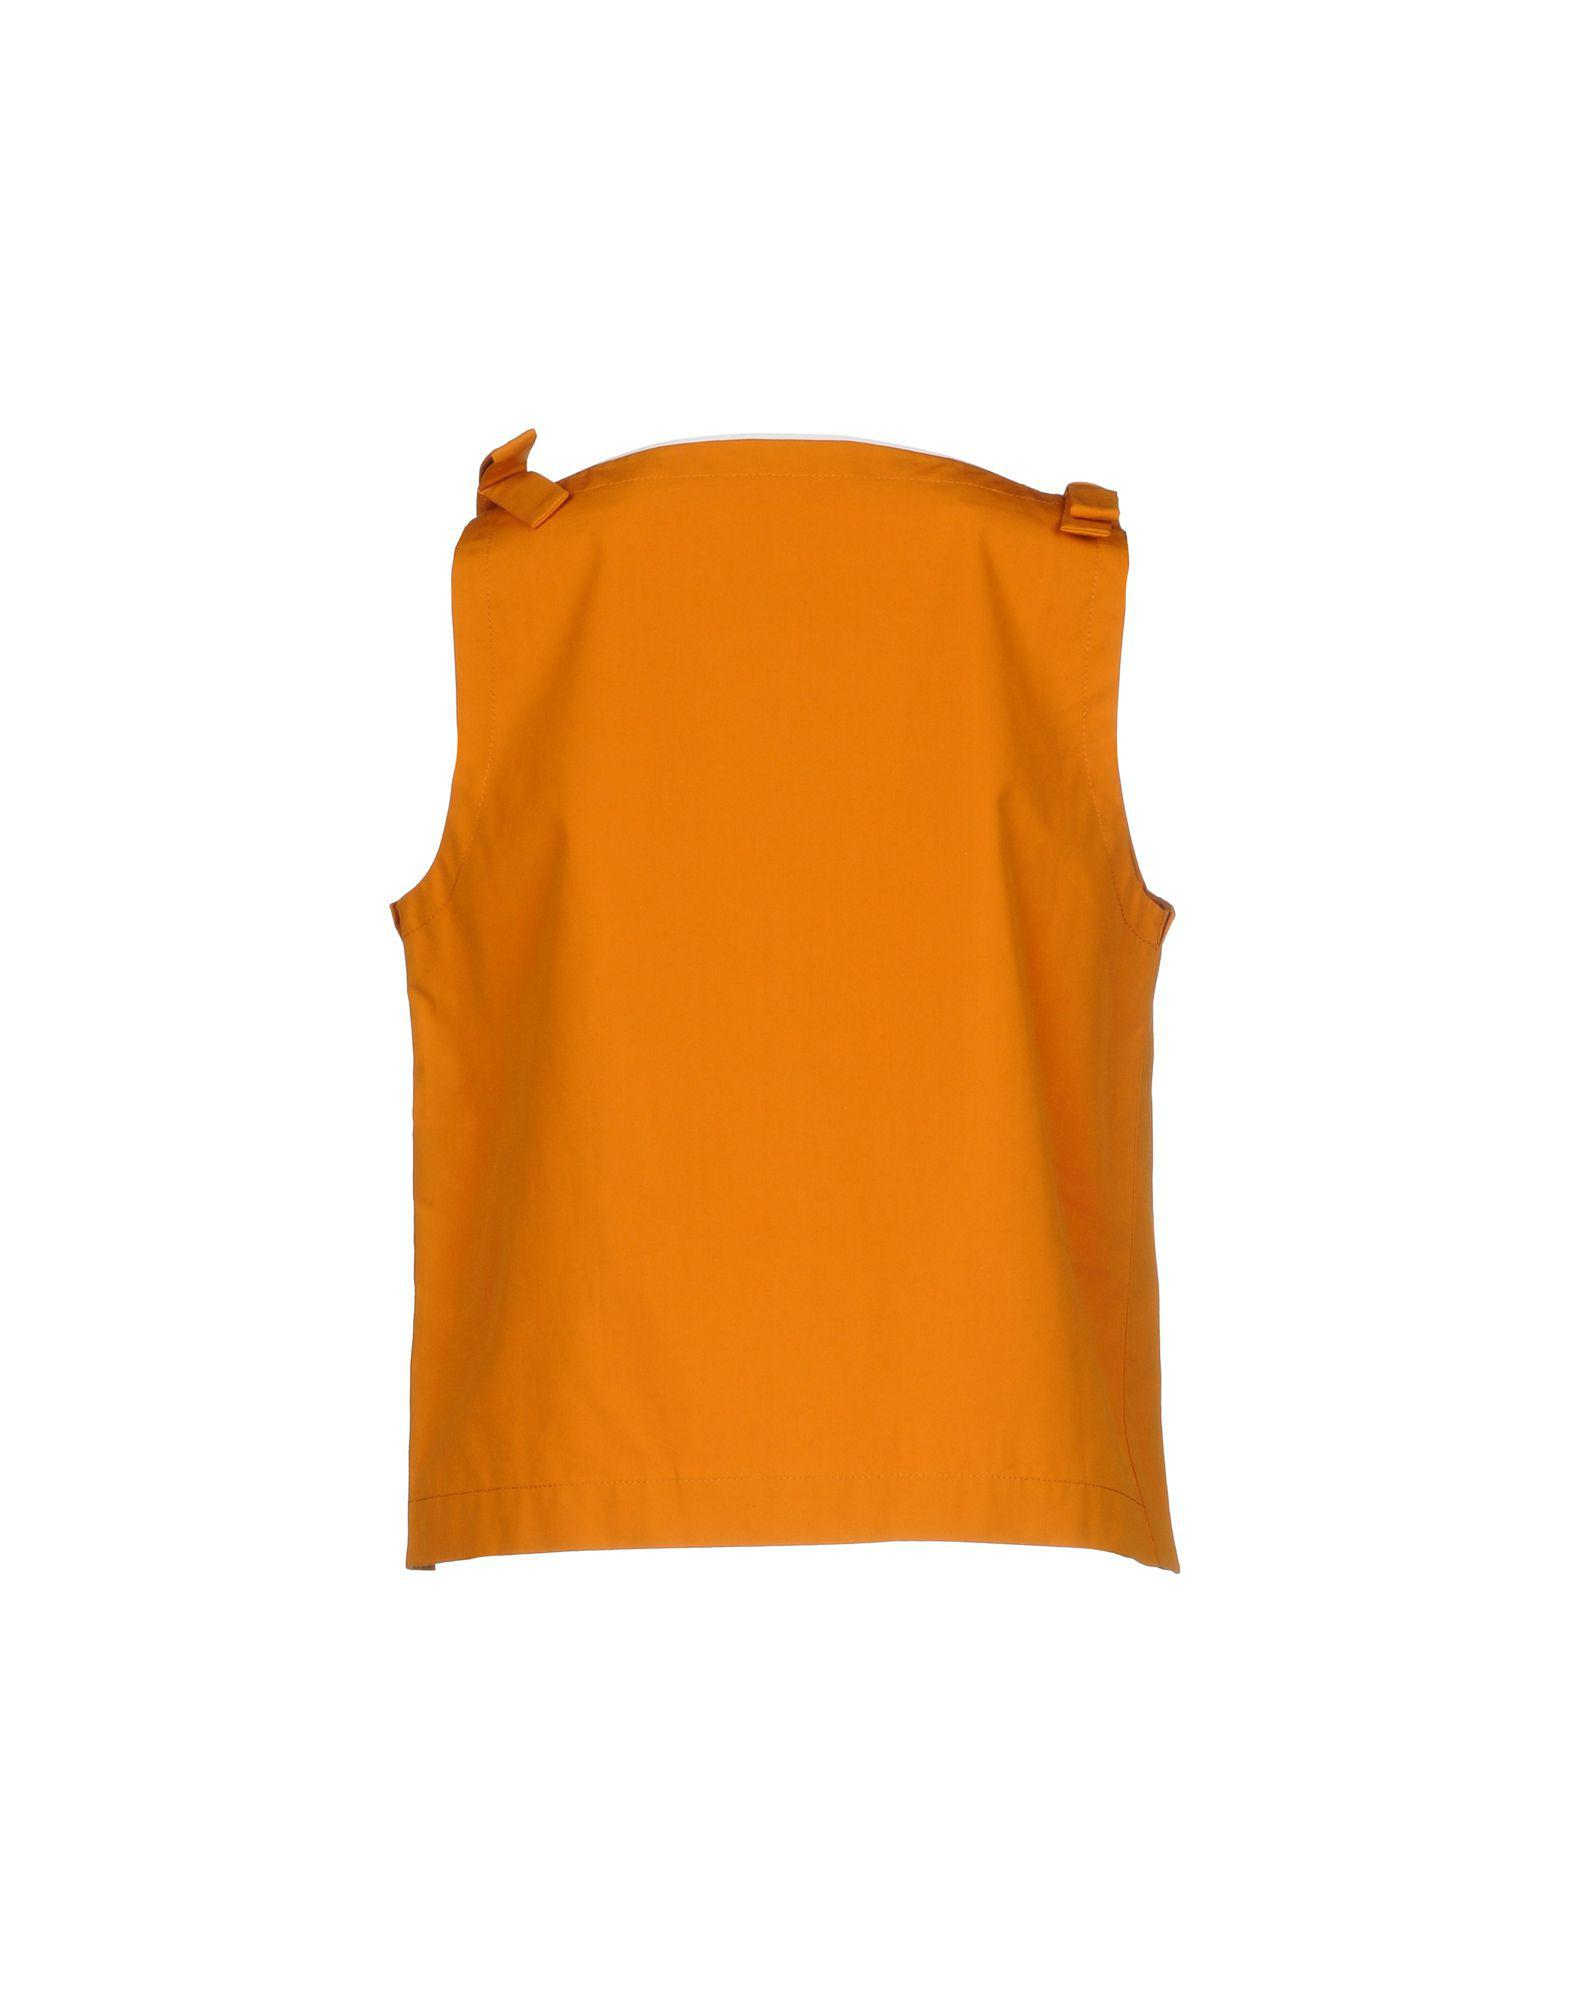 1ca7130caeaf5 Lyst - Fendi Top in Orange